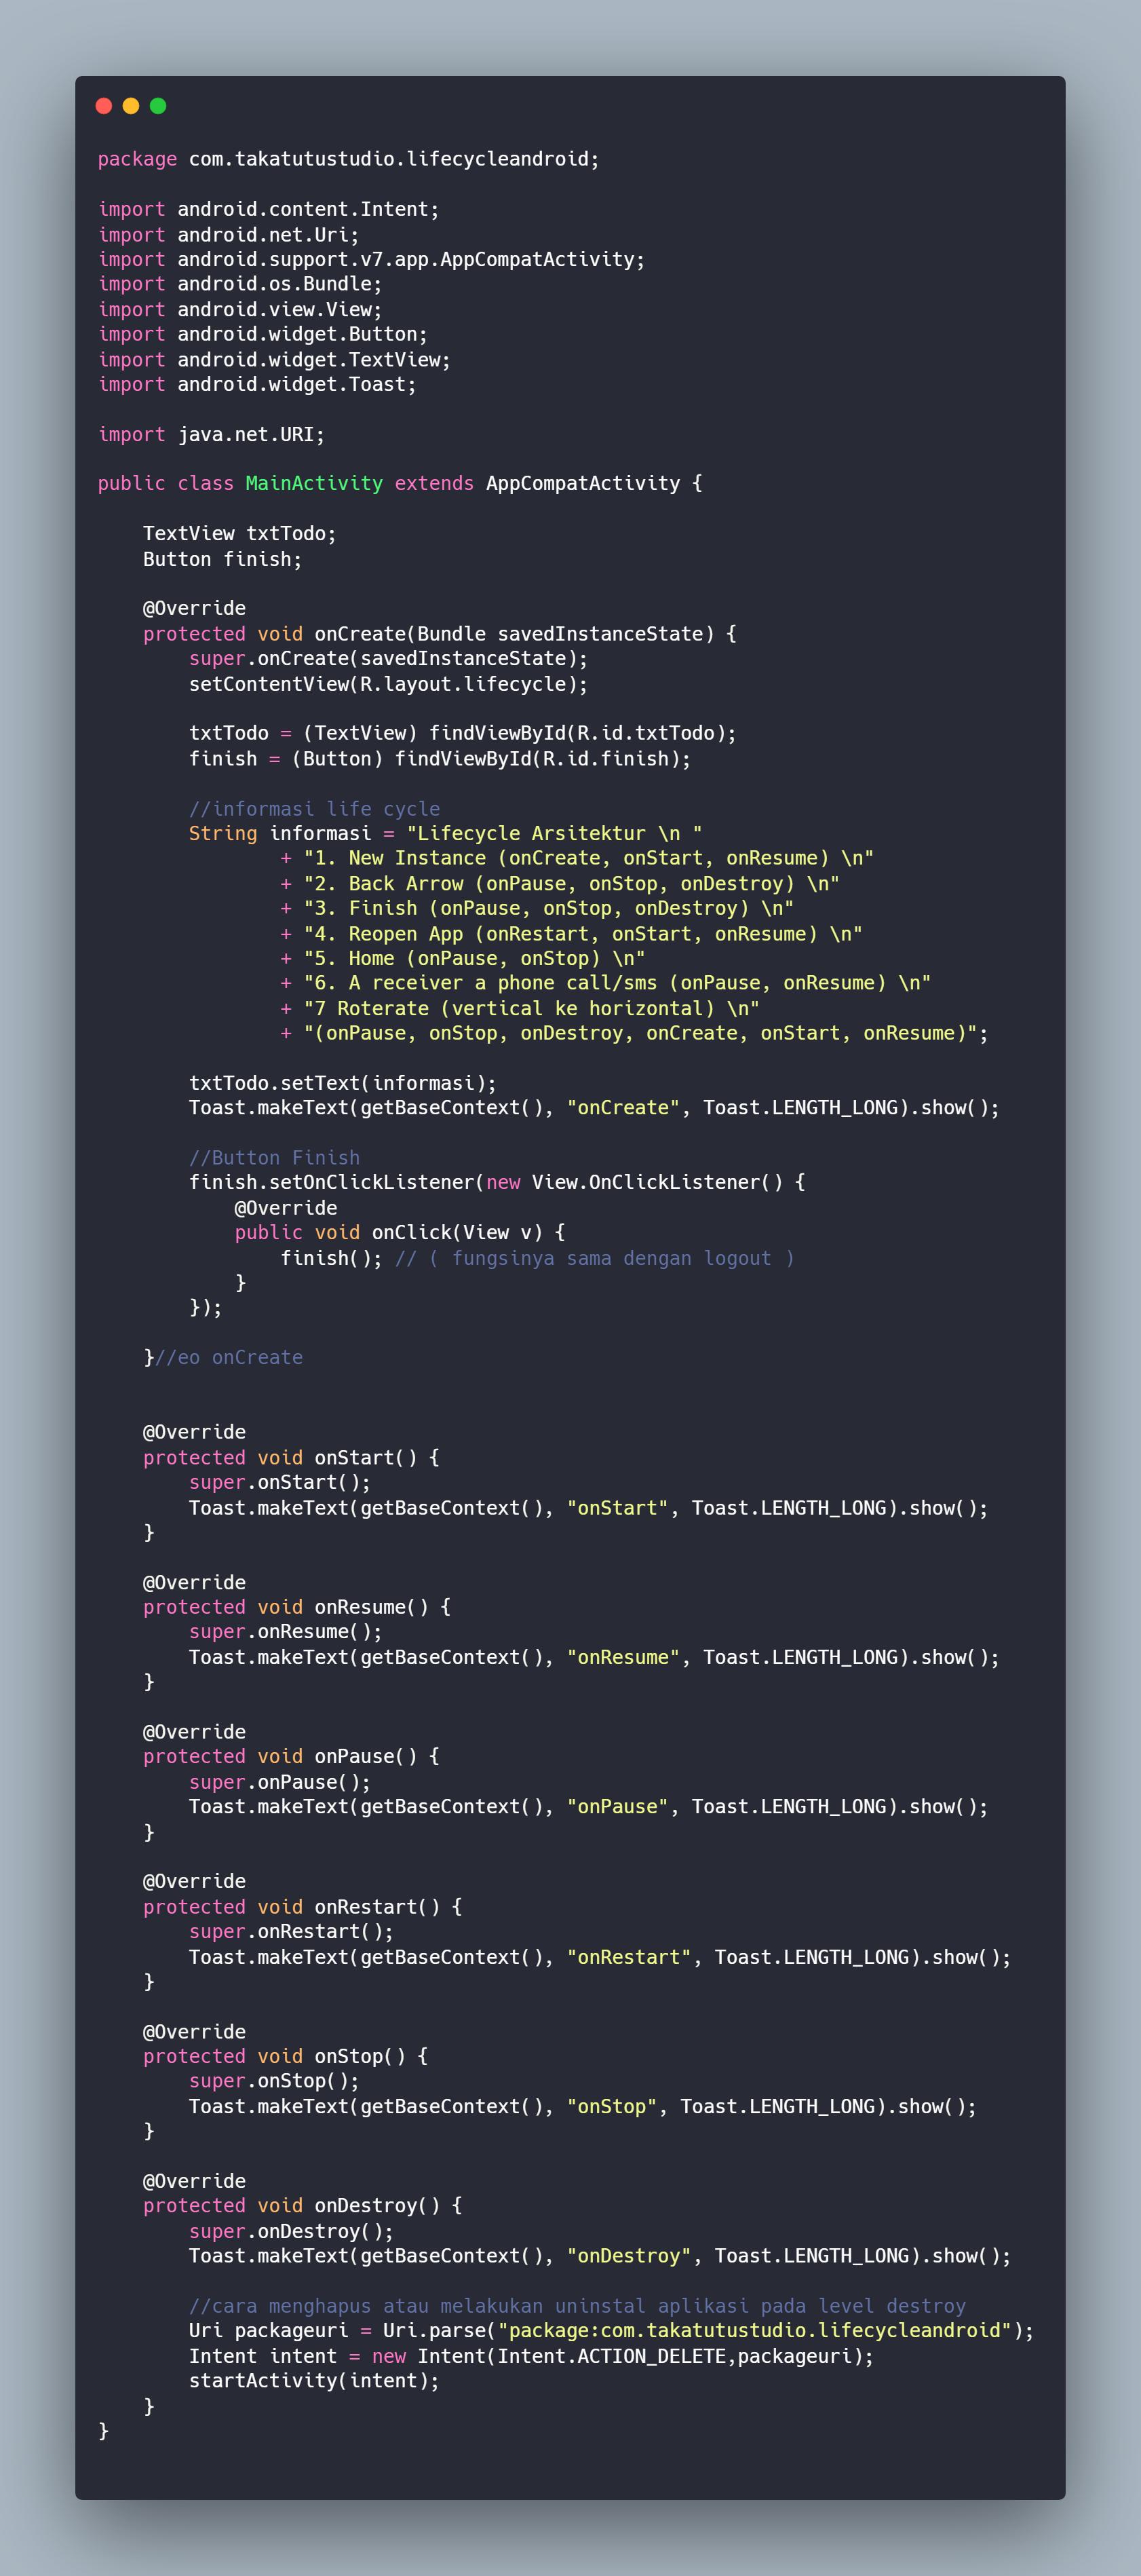 MainActivity.java · Issue #1 · zerkijulian92/LifeCycleAndroid · GitHub